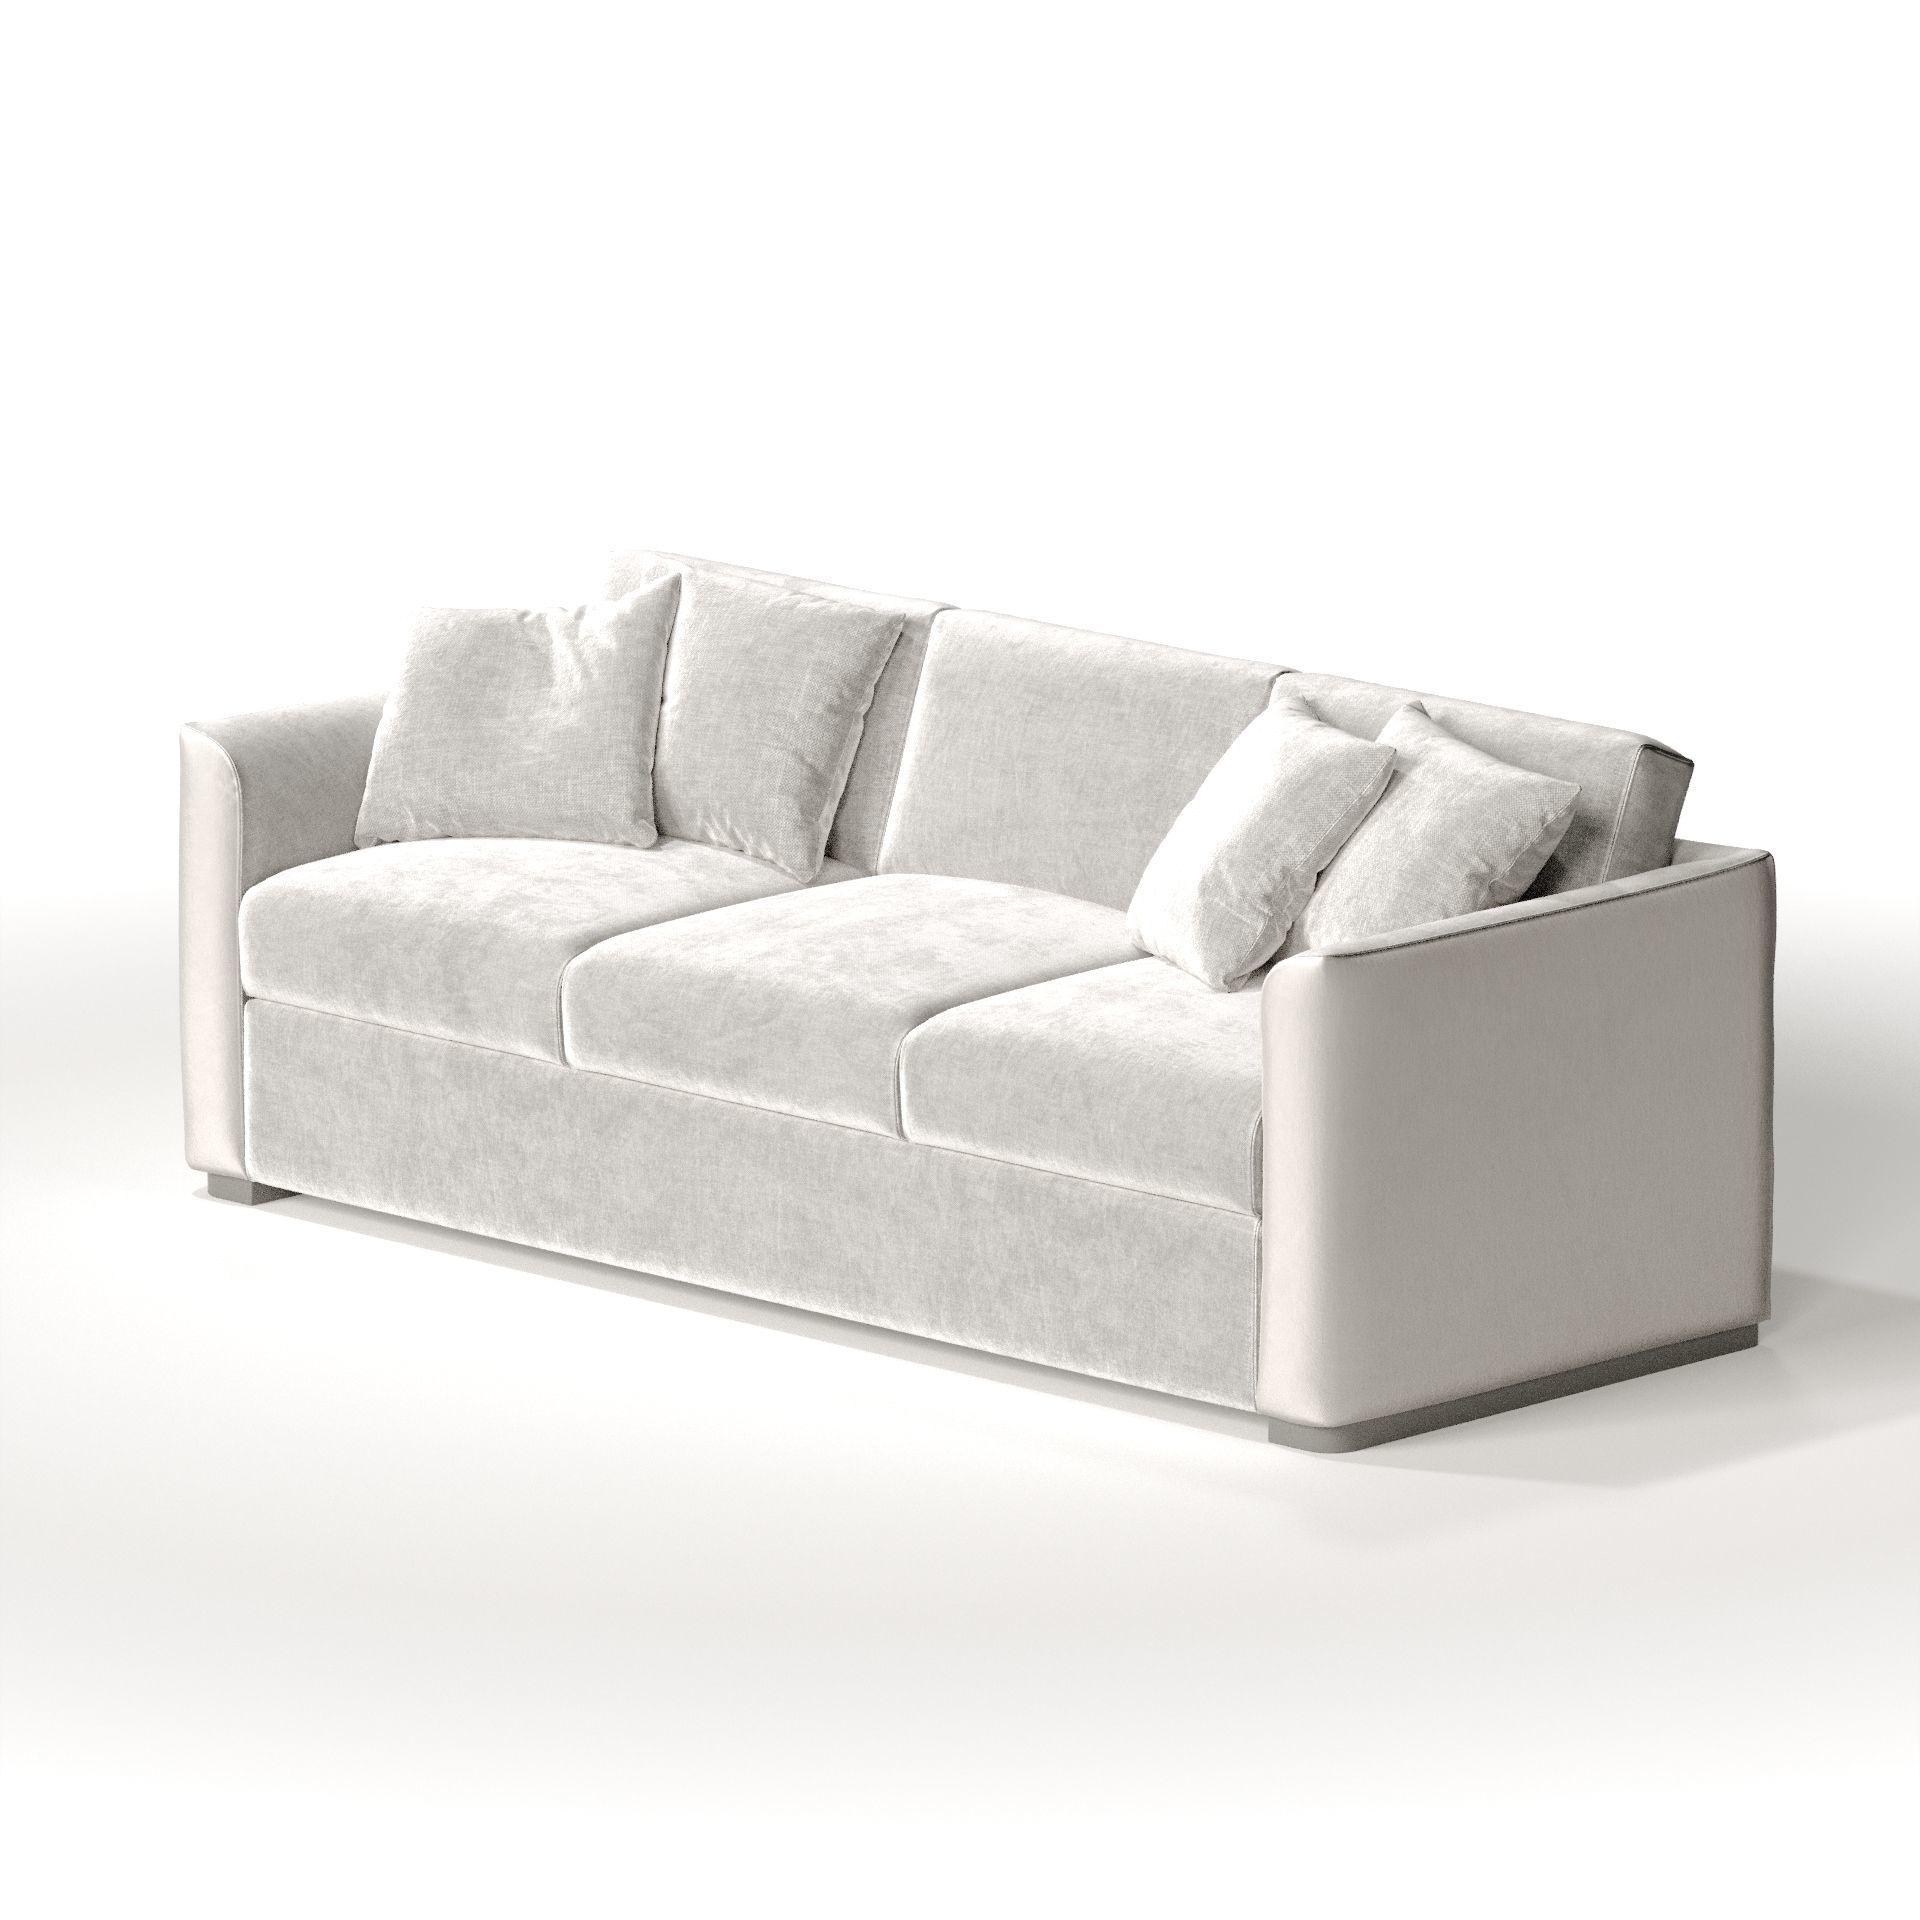 3d a rudin sofa 2786 cgtrader rh cgtrader com a rudin sofa 2519 a rudin sofa 2736